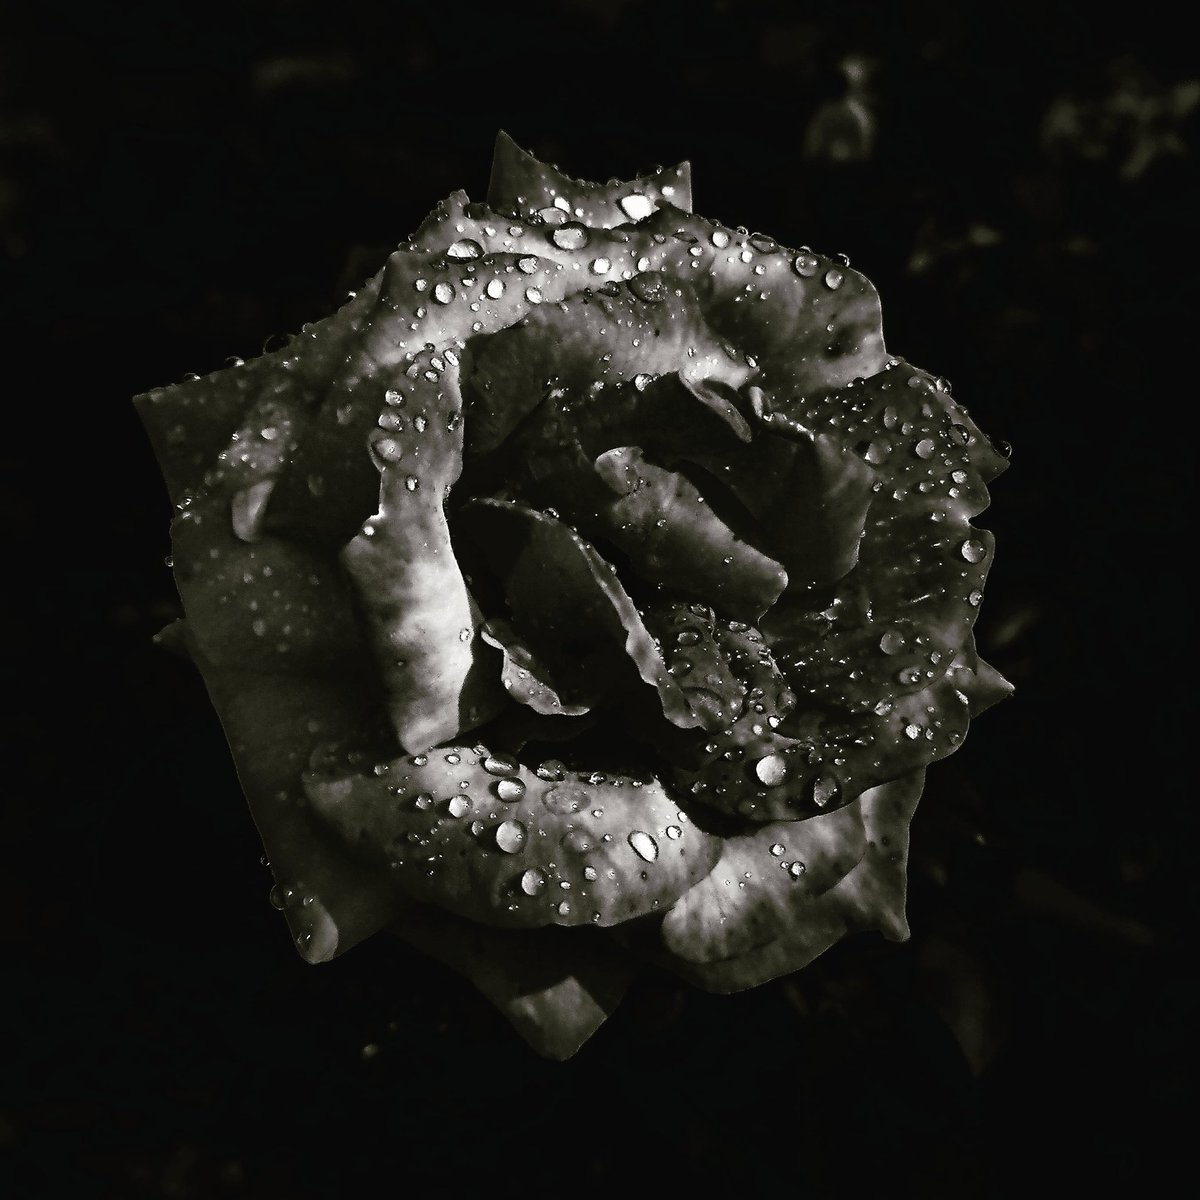 #bw #blackandwhitephotography #black #Raindrops #RAIN #Rosehip #RosesAndRose #rose #FlowersOnFriday #Flowers #flower_is #FLOWERFLOWER #flower #flowerknows #flowerpower #flowerphotography #Hungary #Theme #photooftheday #PHOTOS #PhotographyIsArt #photograghy #photographyislife